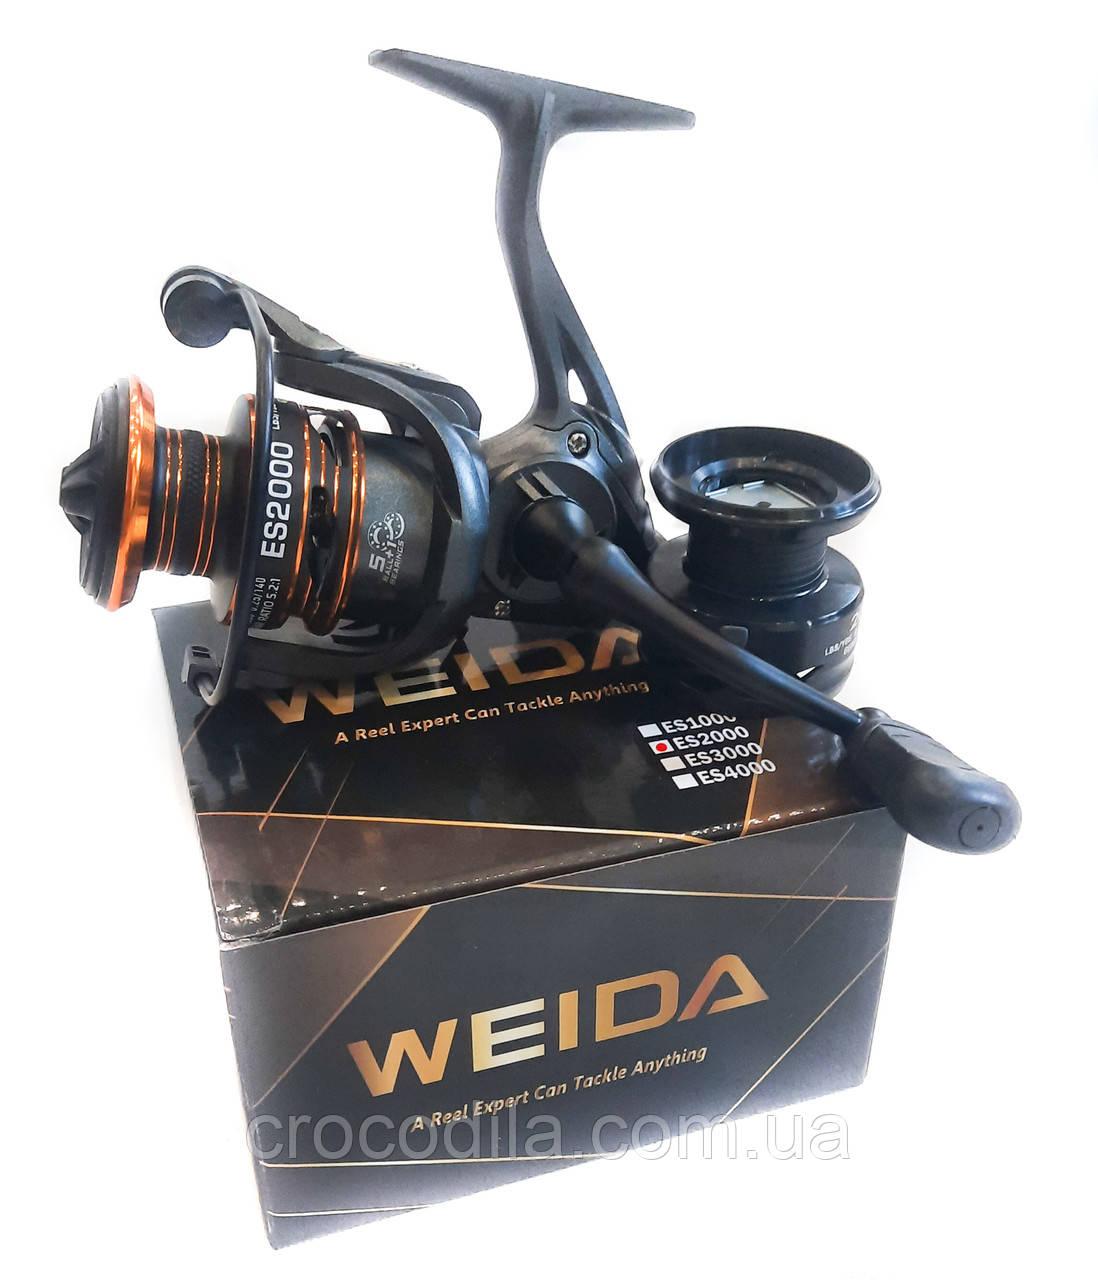 Спиннинговая котушка Kaida ( Weida) ES 2000 5+1